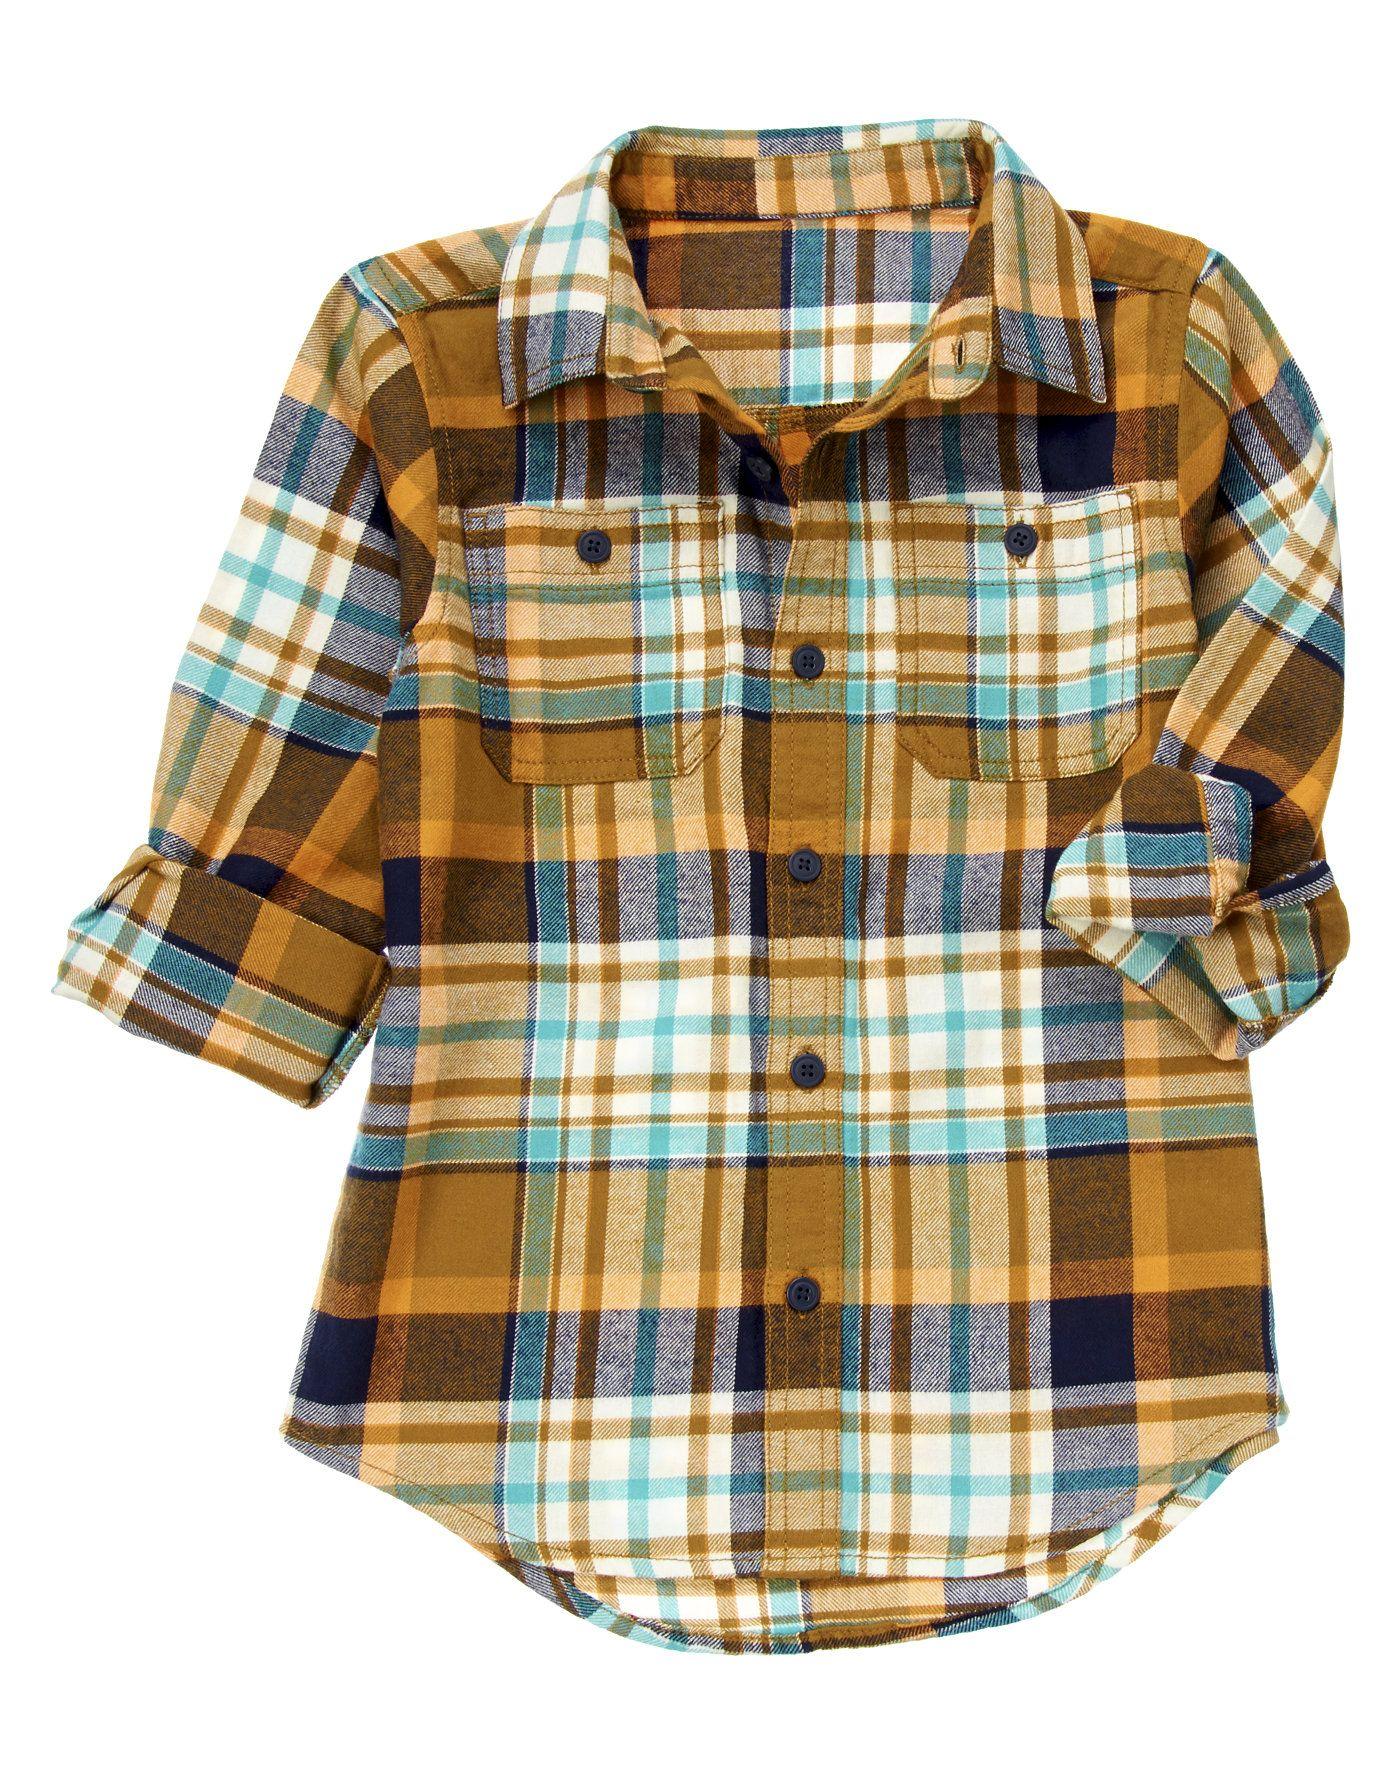 Dress up flannel shirt  Plaid Flannel Shirt  Family pic colors outfit ideas  Pinterest